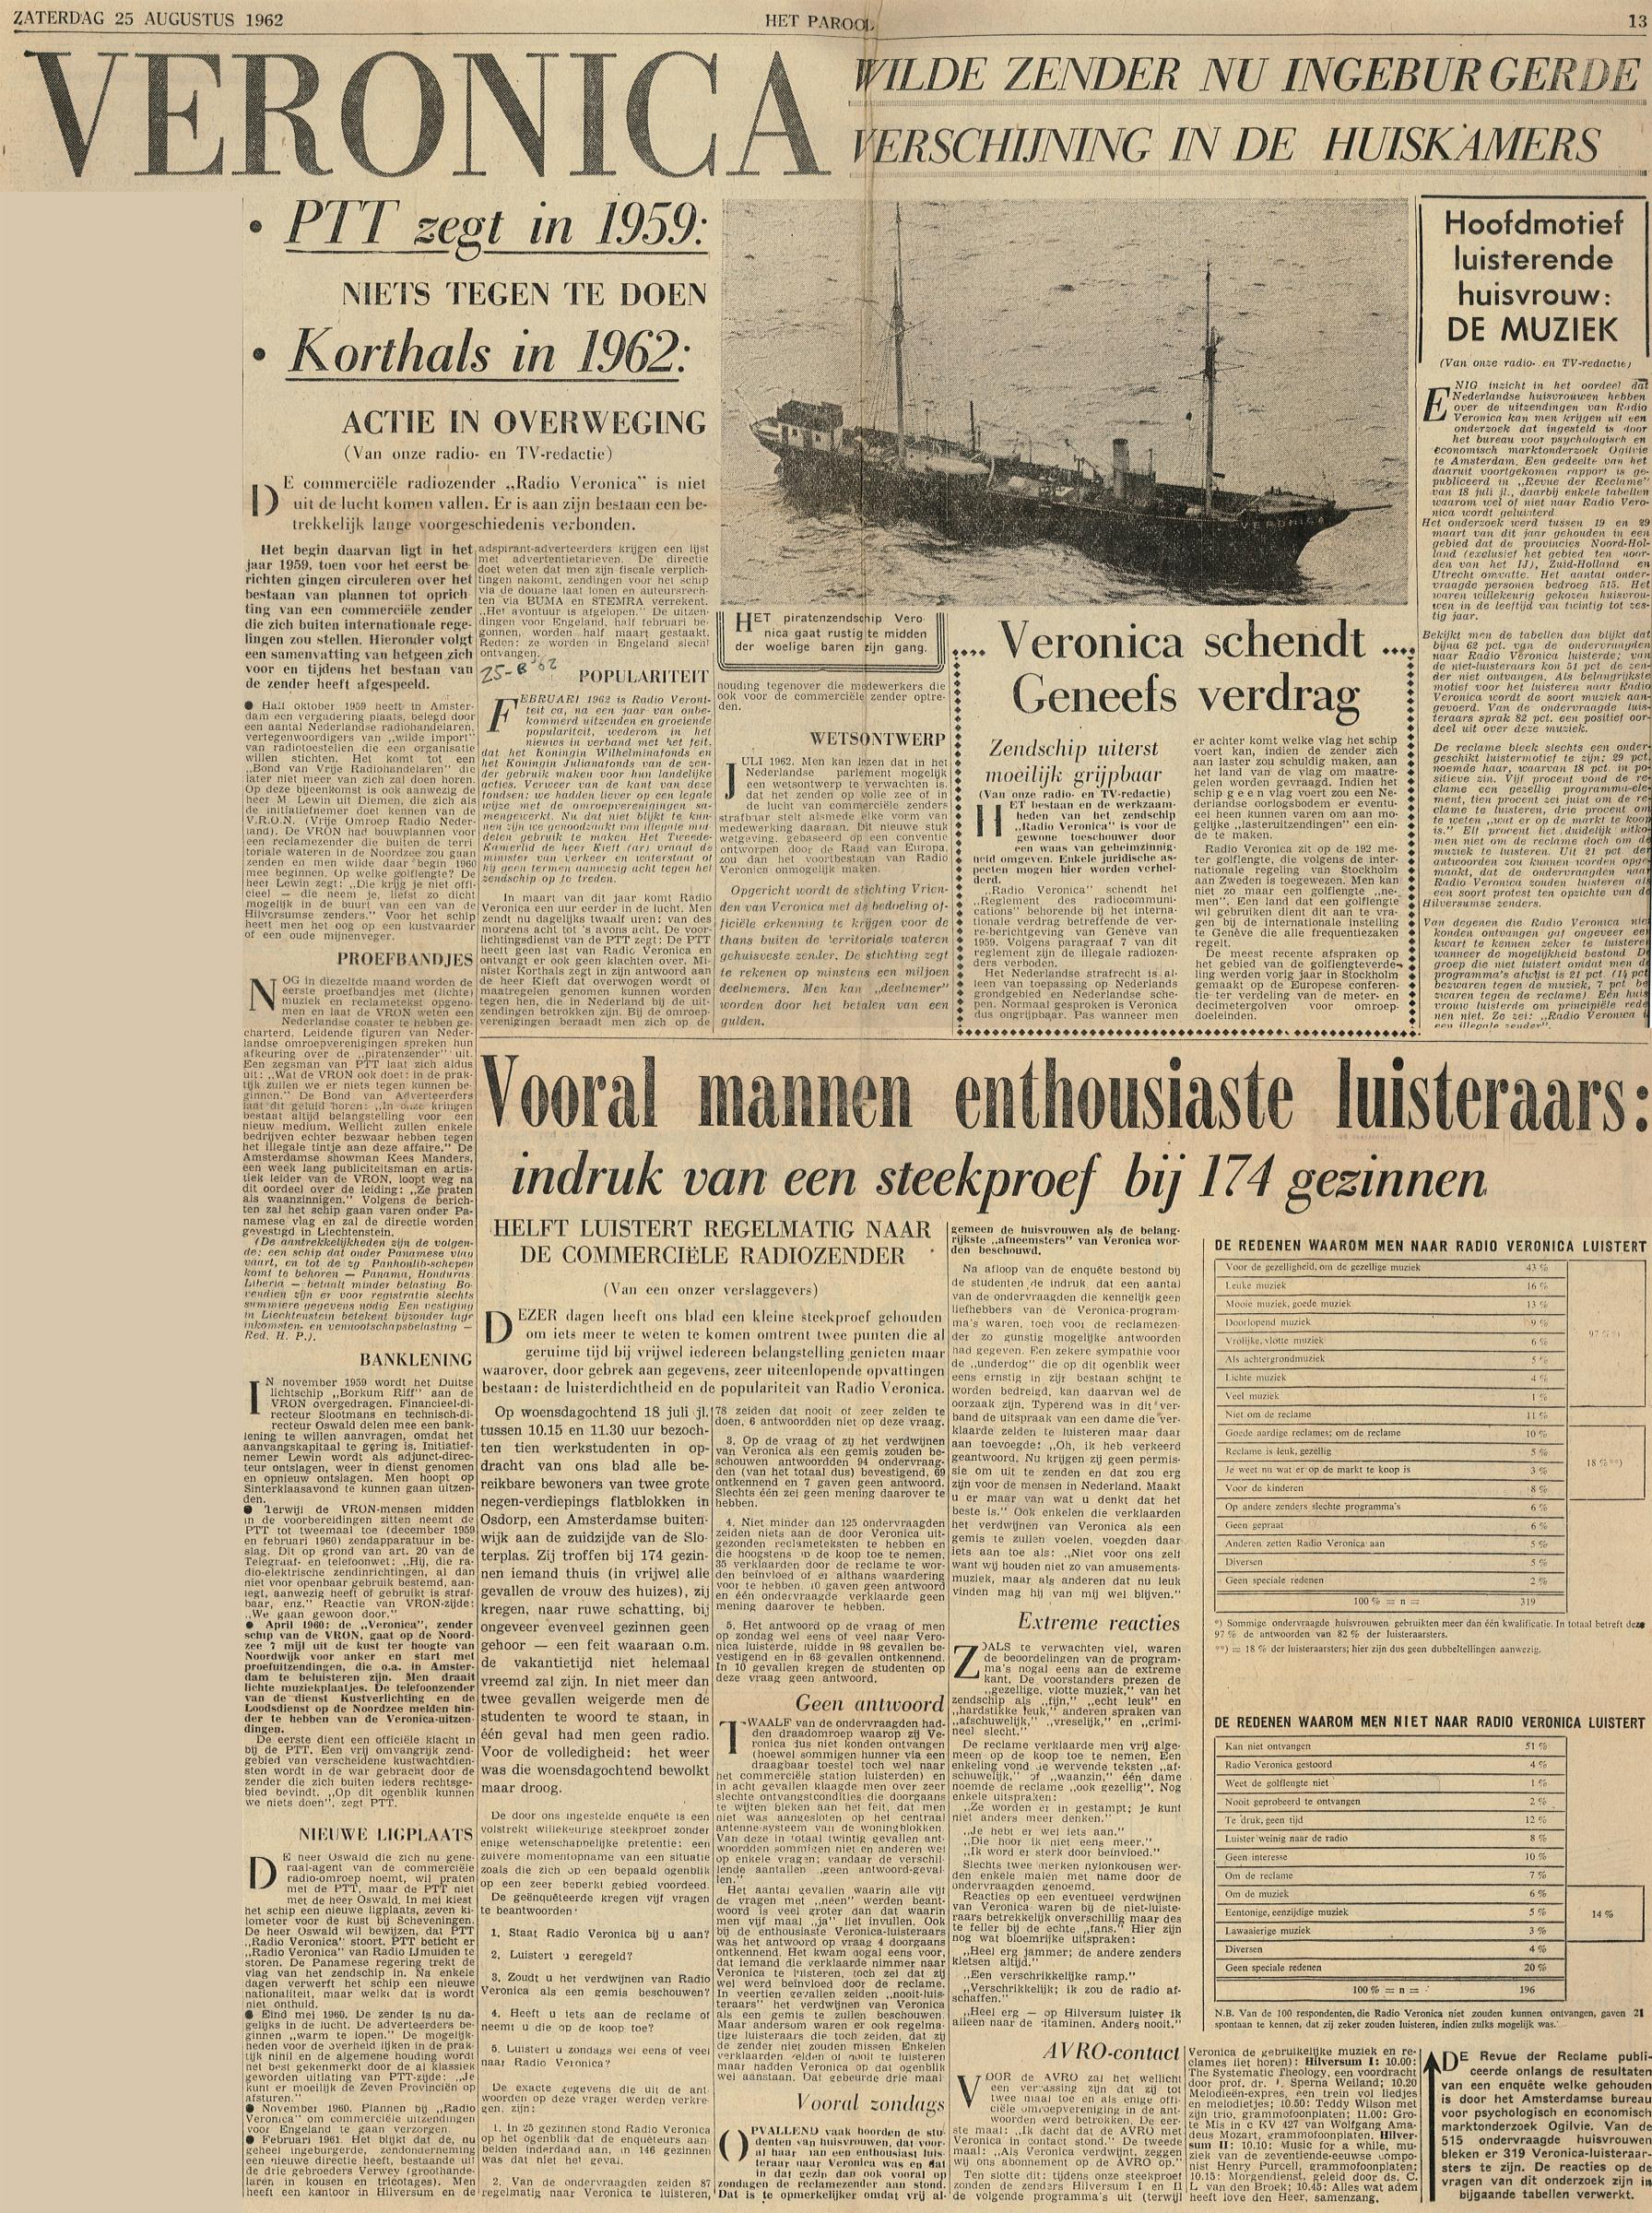 19620825 Parool Veronica wilde zender.jpg